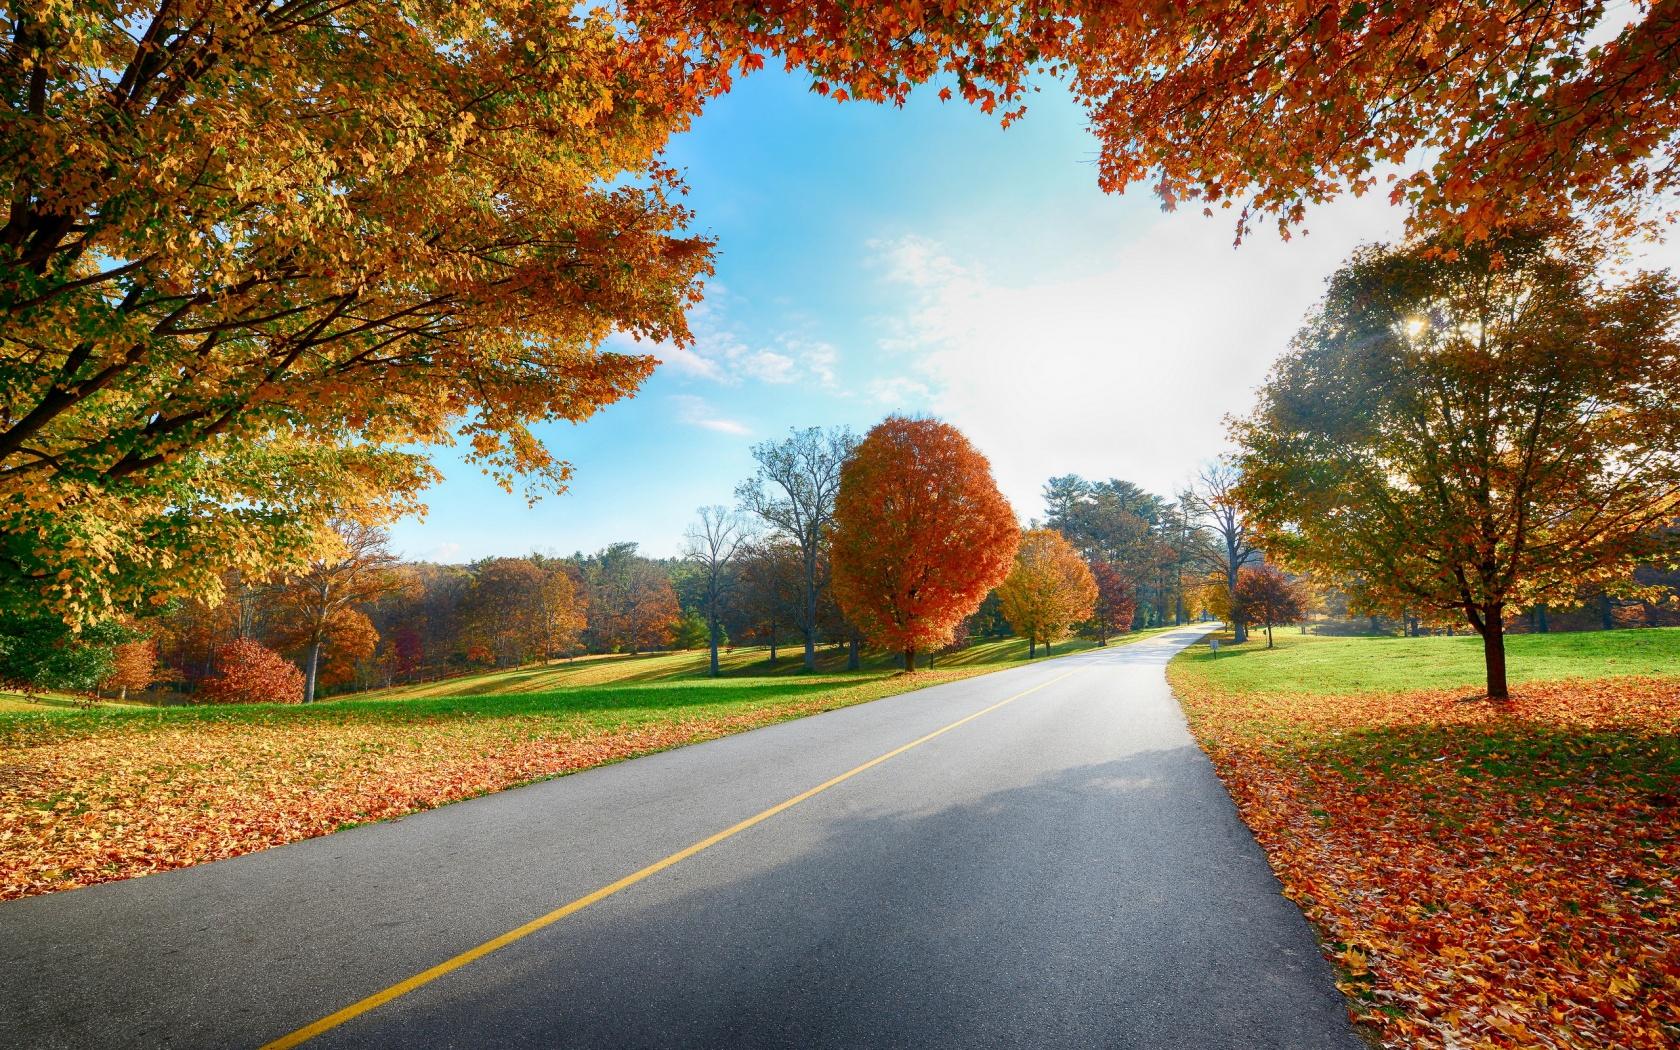 fall wallpaper 1680x1050 - photo #26